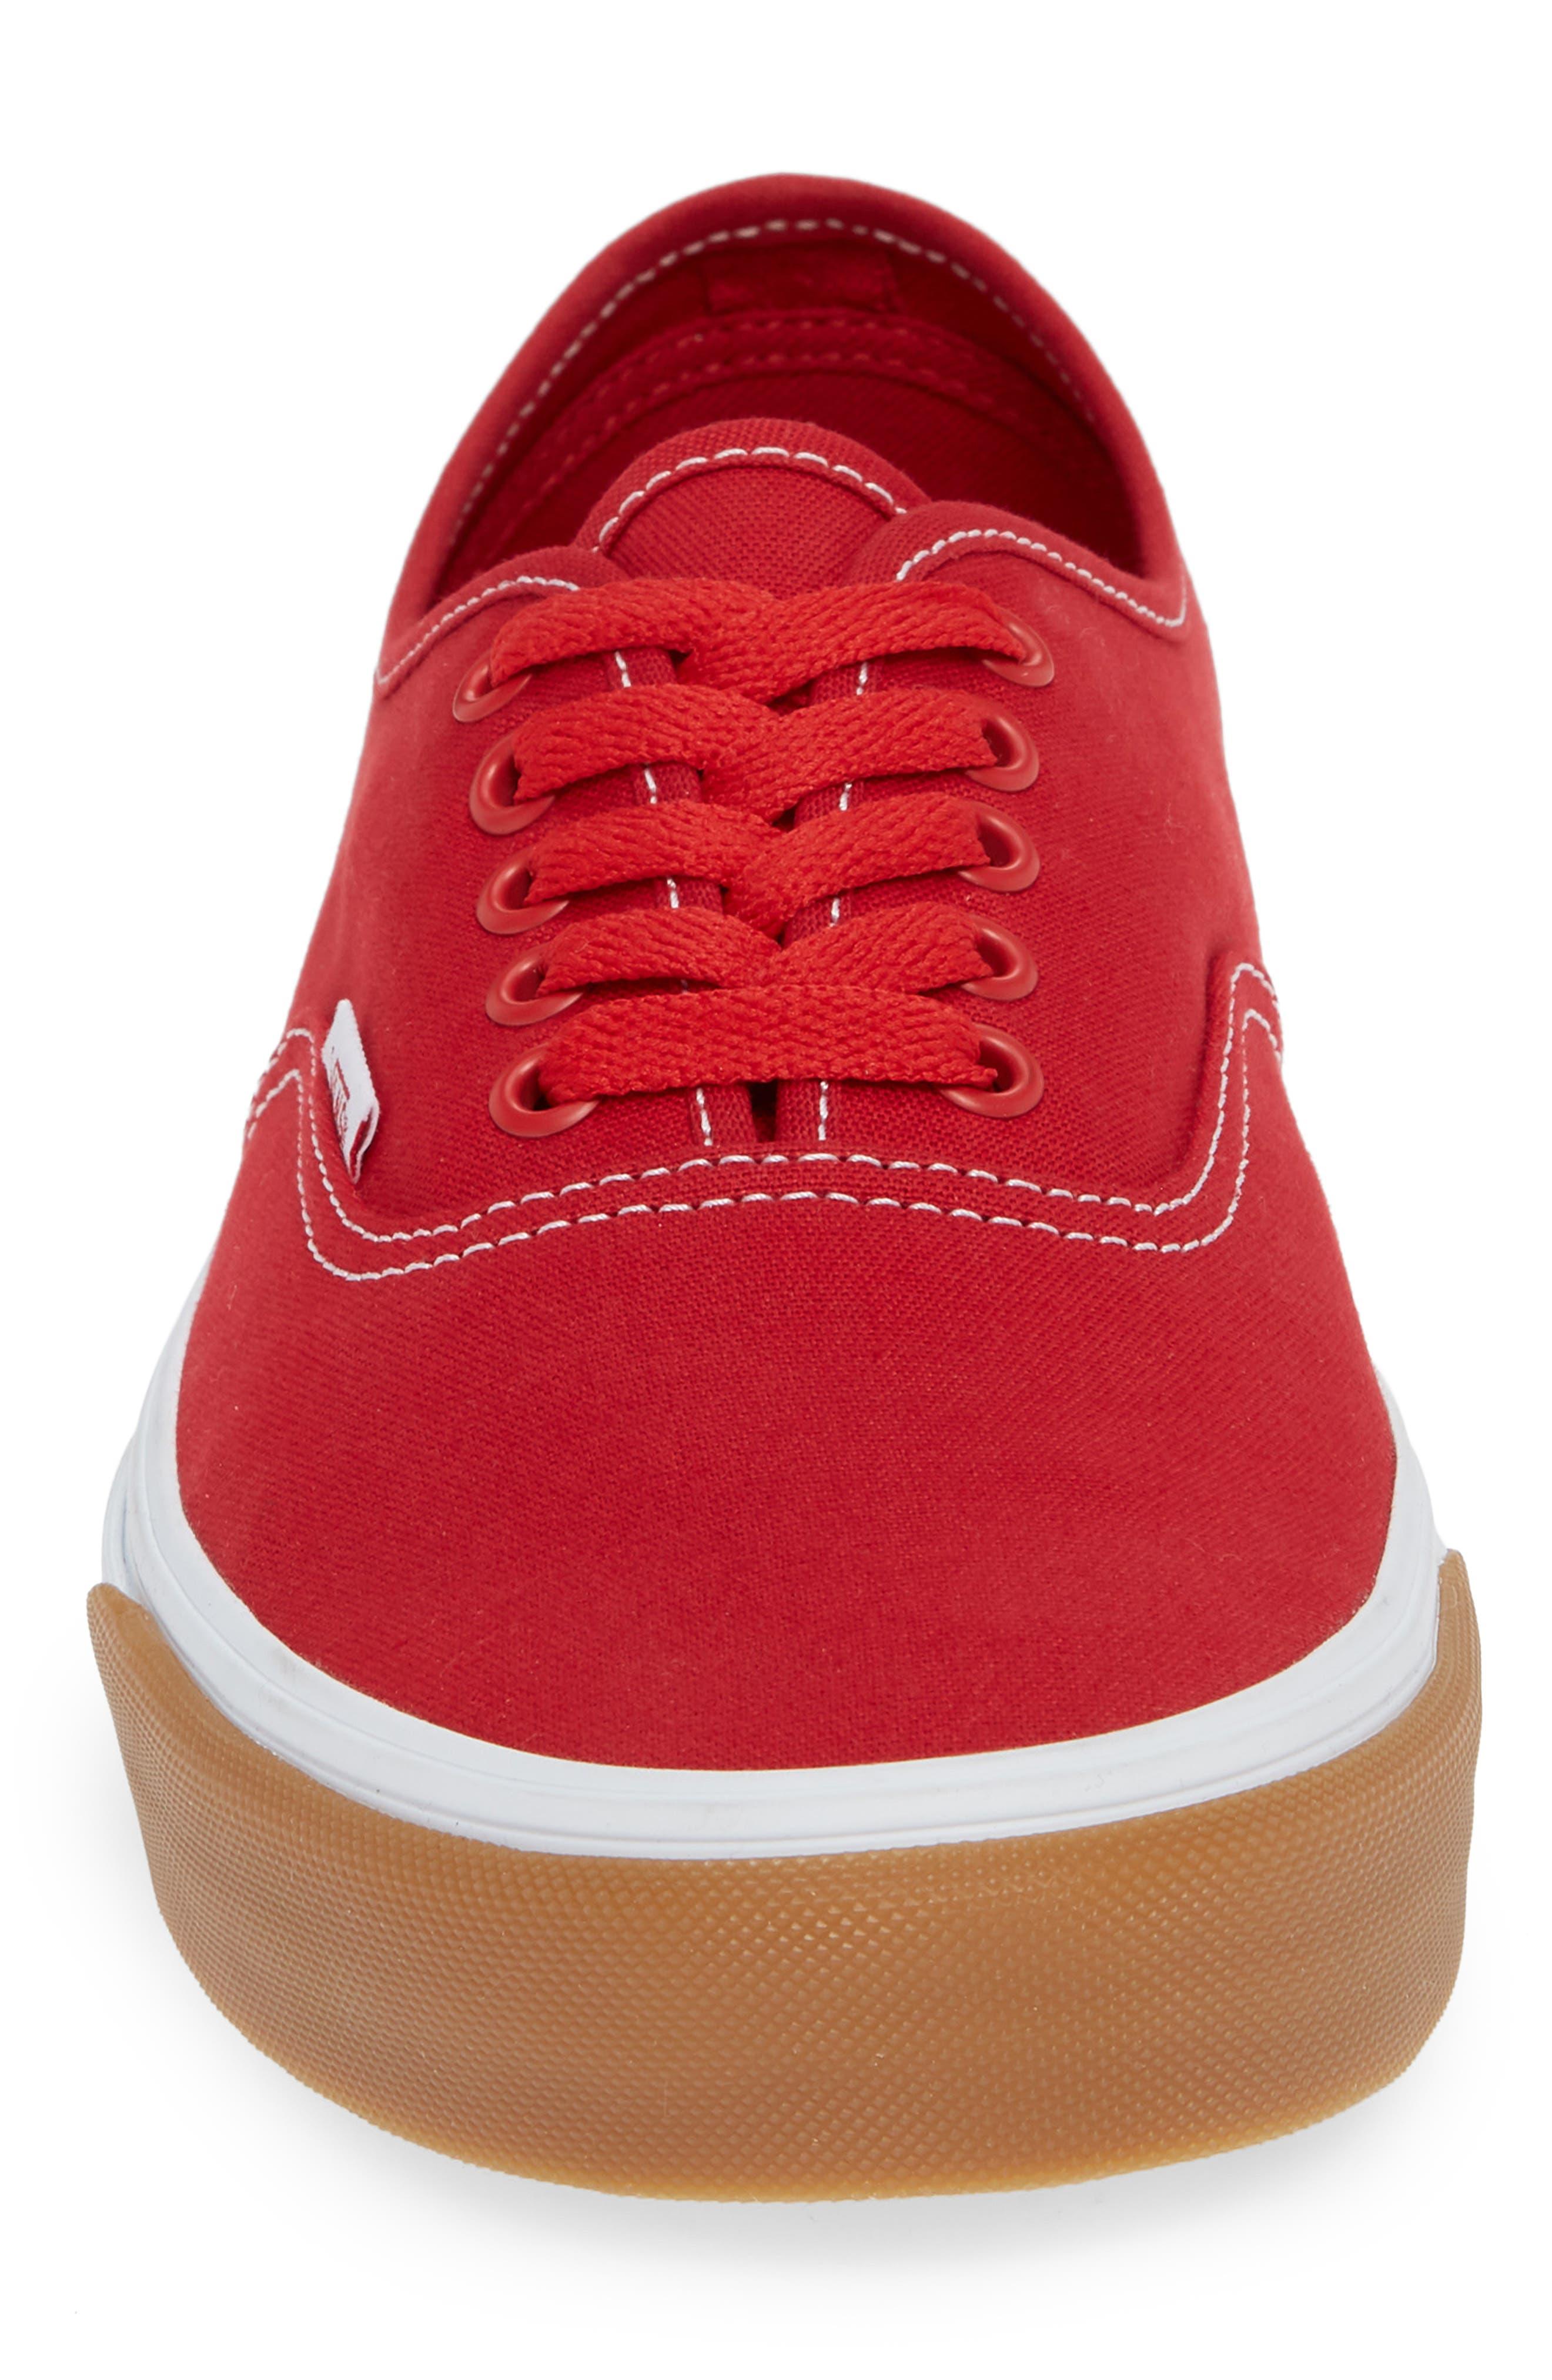 Authentic Gum Bumper Sneaker,                             Alternate thumbnail 5, color,                             Red/ True White